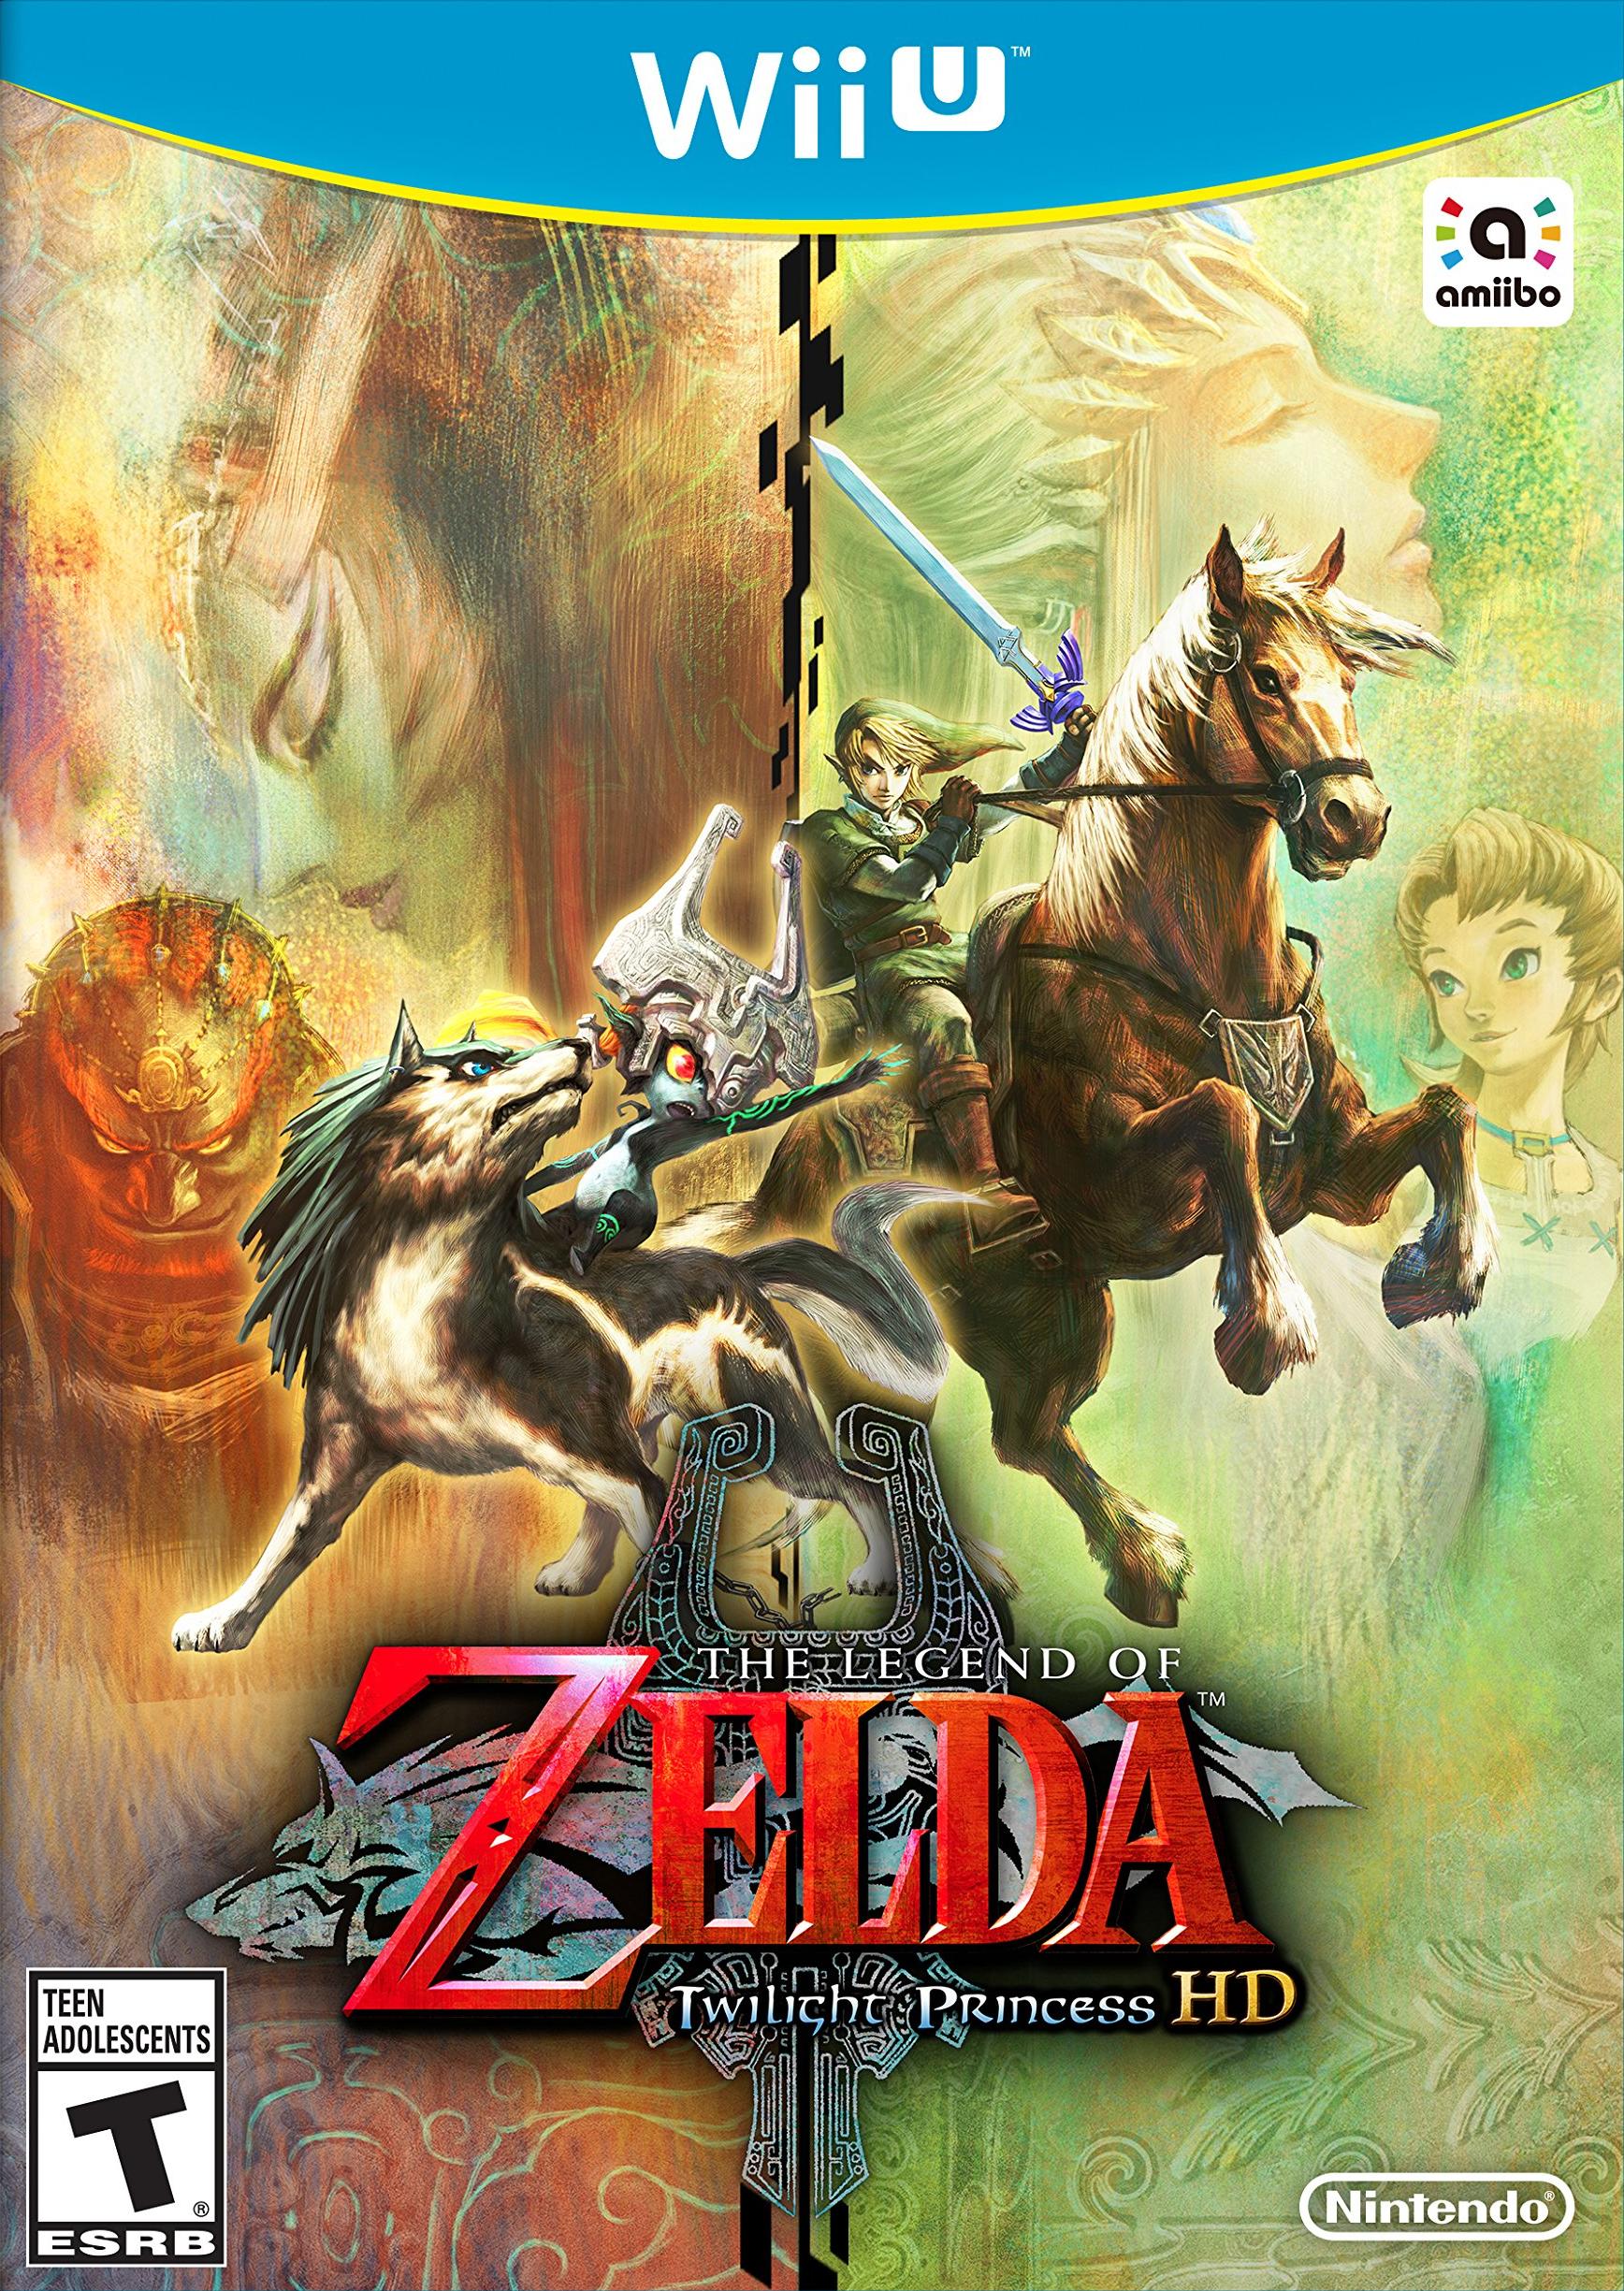 The Legend Of Zelda Twilight Princess HD Sans Amiibo/Wii U